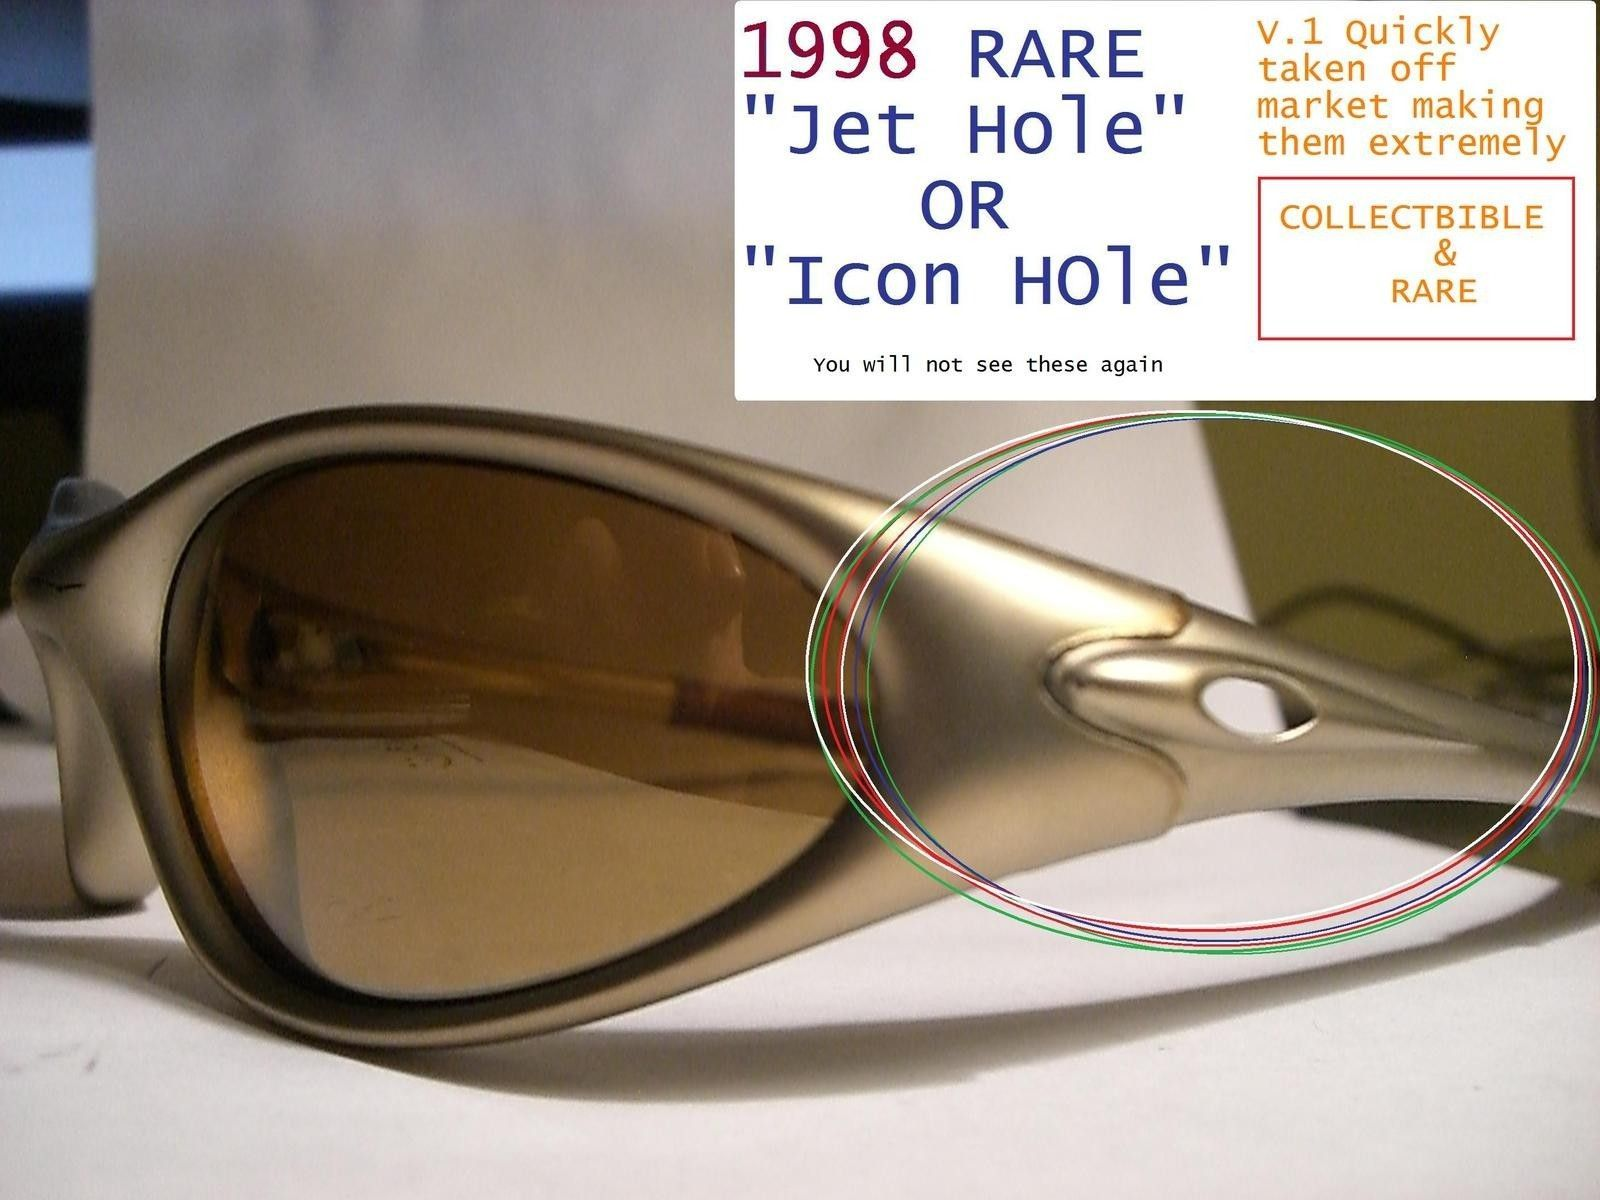 FS: Very RARE V.1 Minute Oakley Sunglasses - 1998minutes.jpg